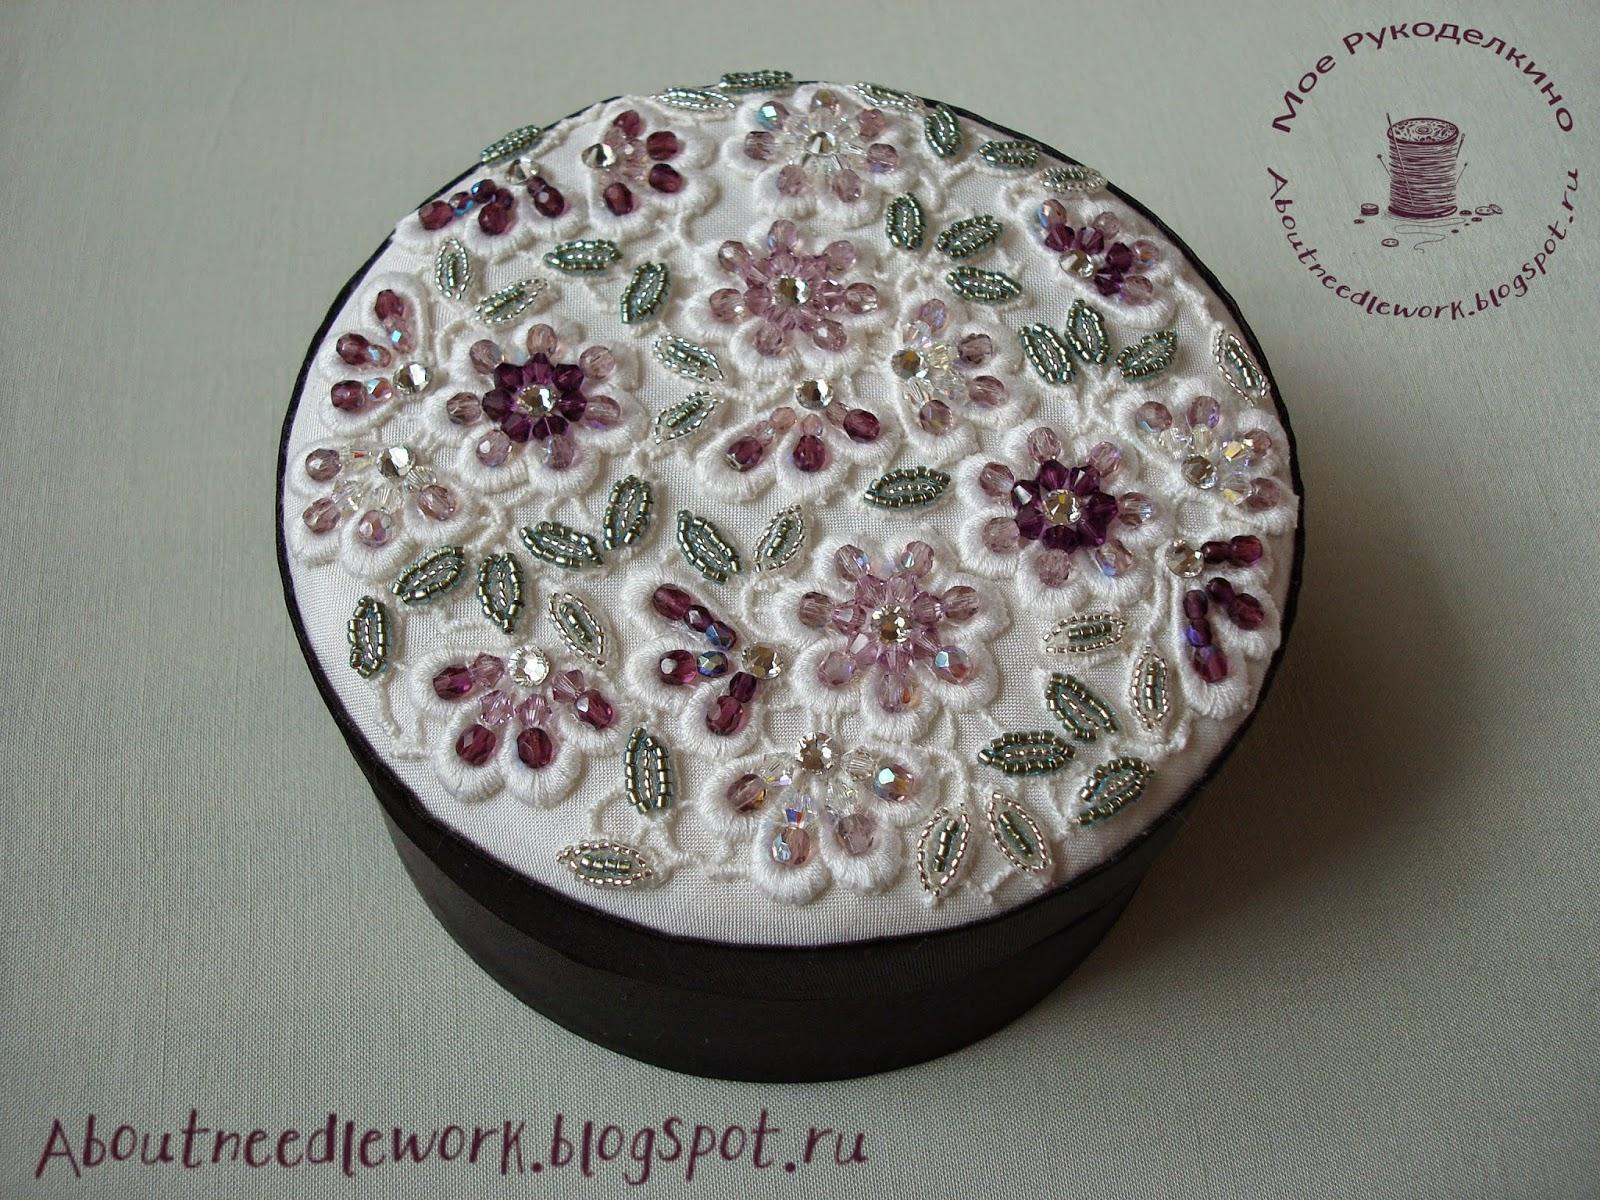 Мастер-класс: шкатулка вышивка бисером